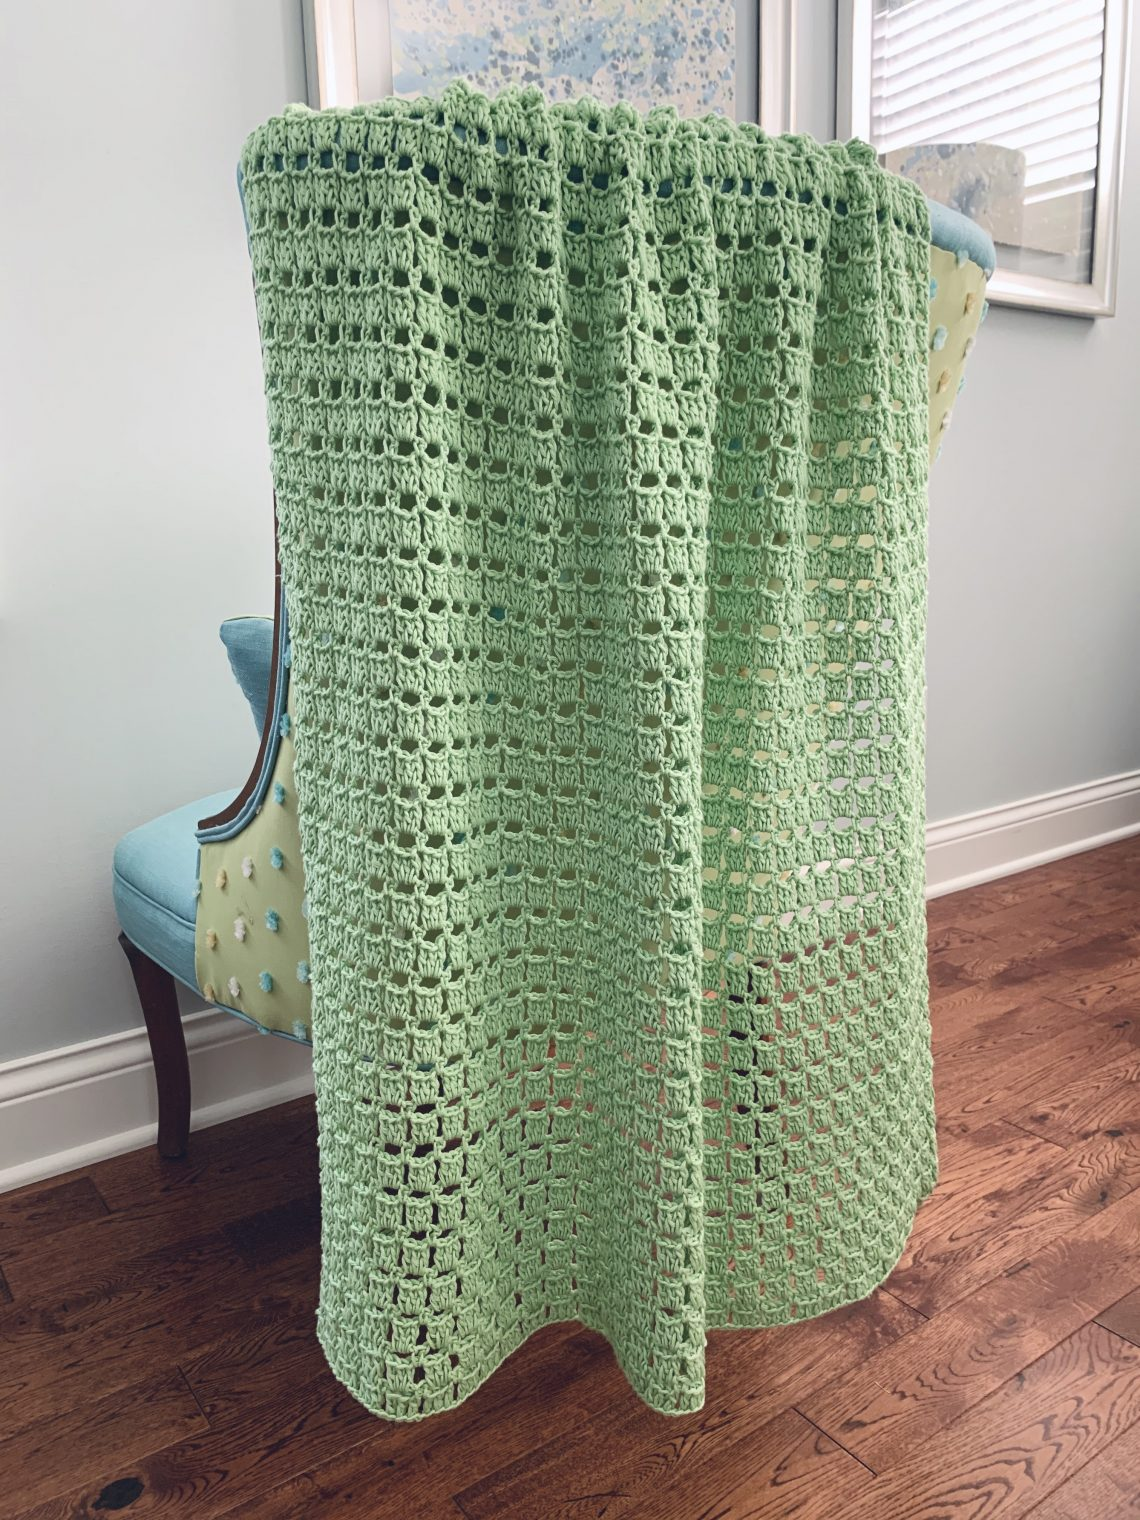 Crochet Baby Blanket Free Pattern Knitcroaddict